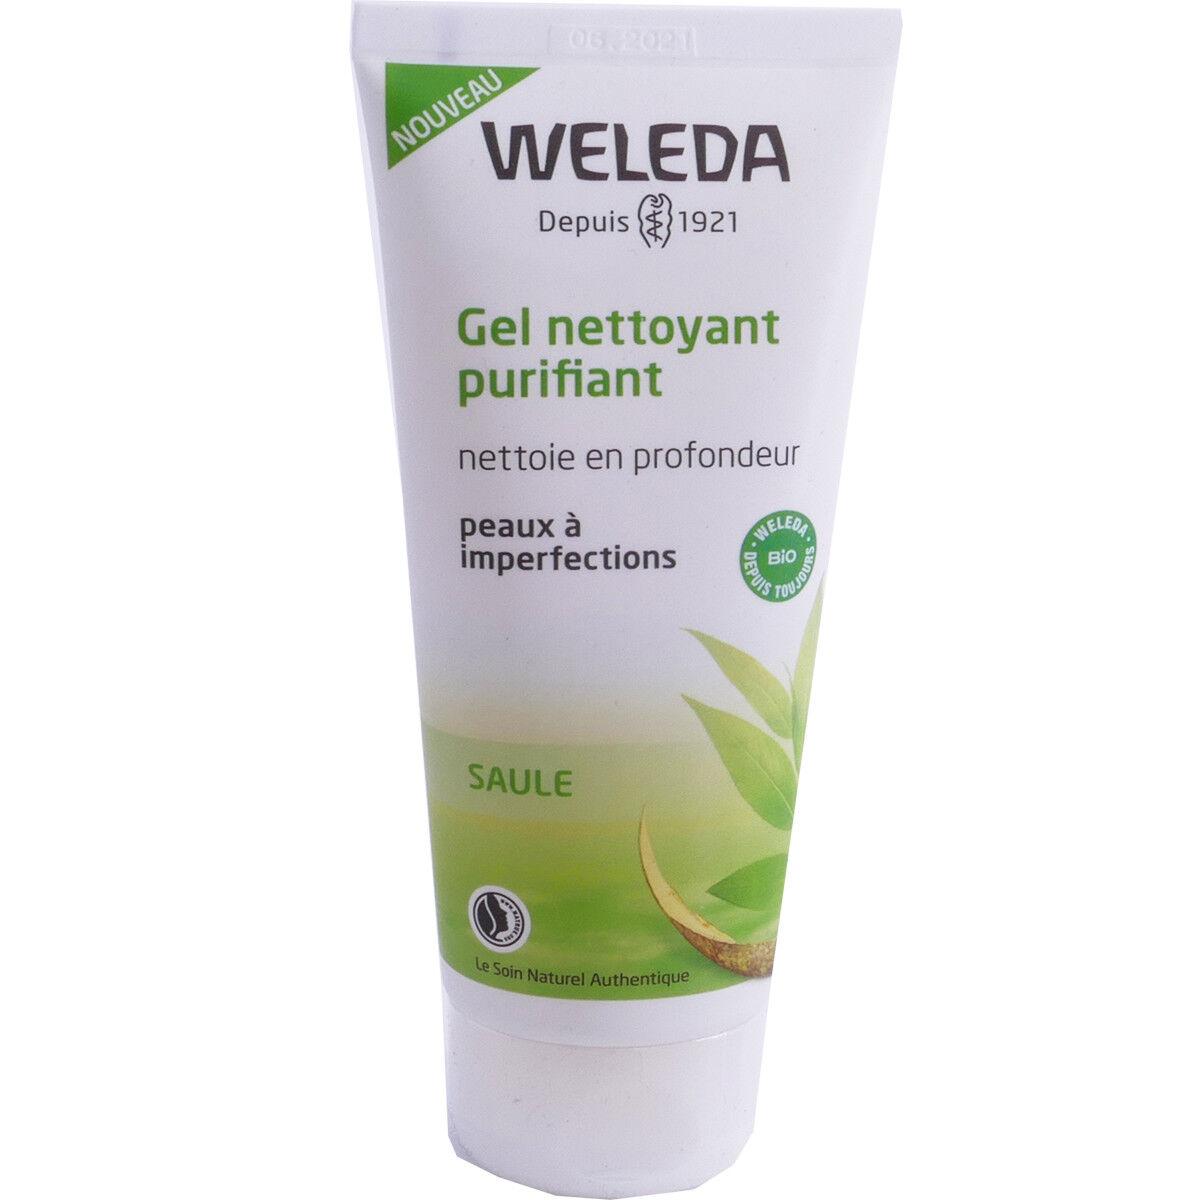 Weleda gel nettoyant purifiant 100 ml bio